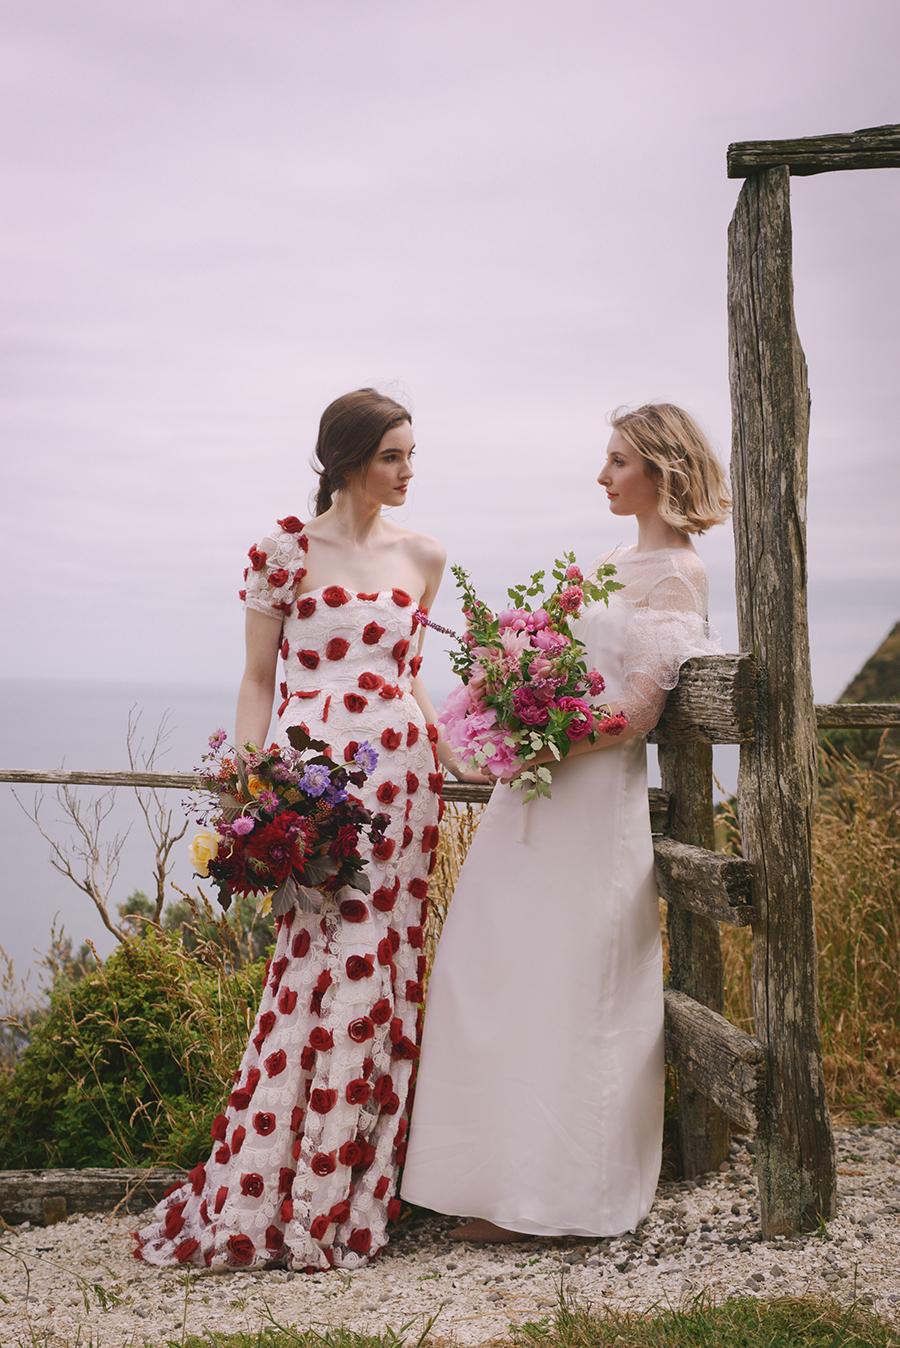 Well+Travelled+Bride+Wellington+Elopement (10).jpeg